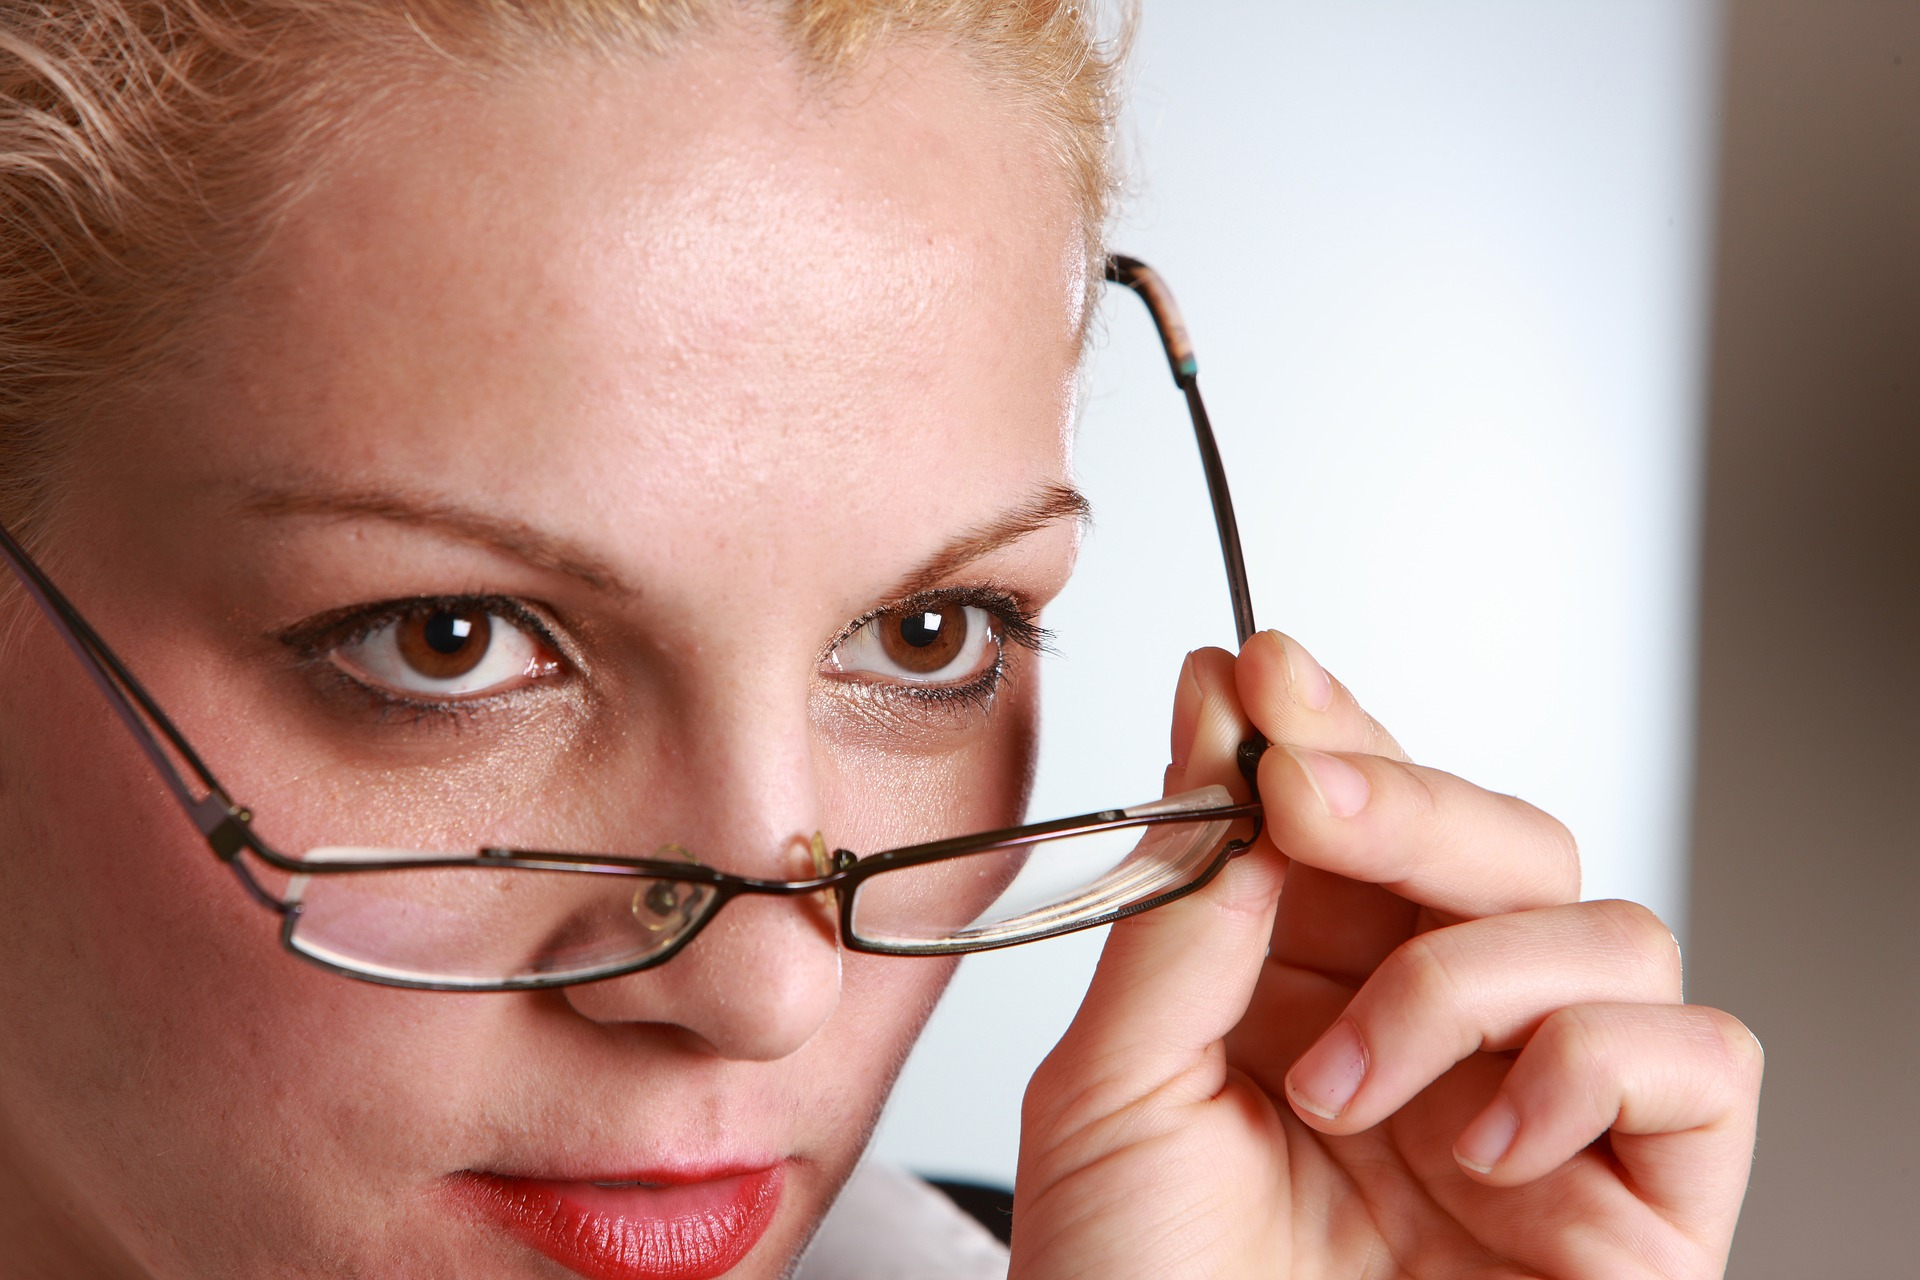 Lehrerin nimmt Brille ab